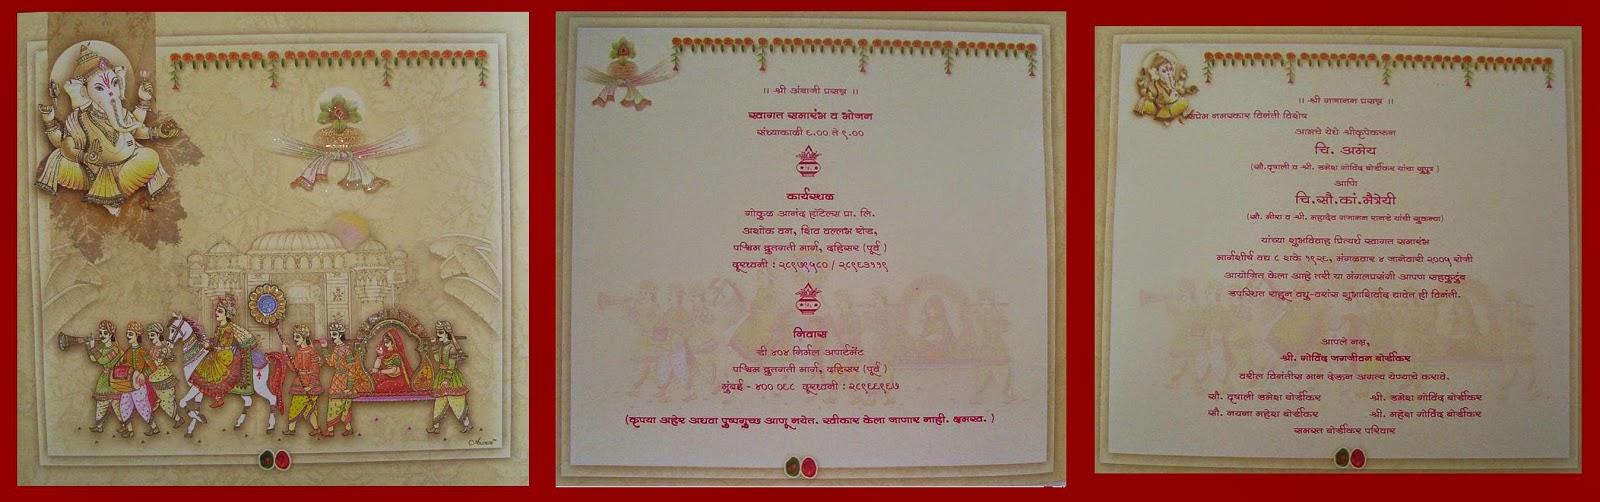 Wedding ceremony invitation wordings in marathi wedding dress wedding ceremony invitation wordings in marathi matik for stopboris Gallery